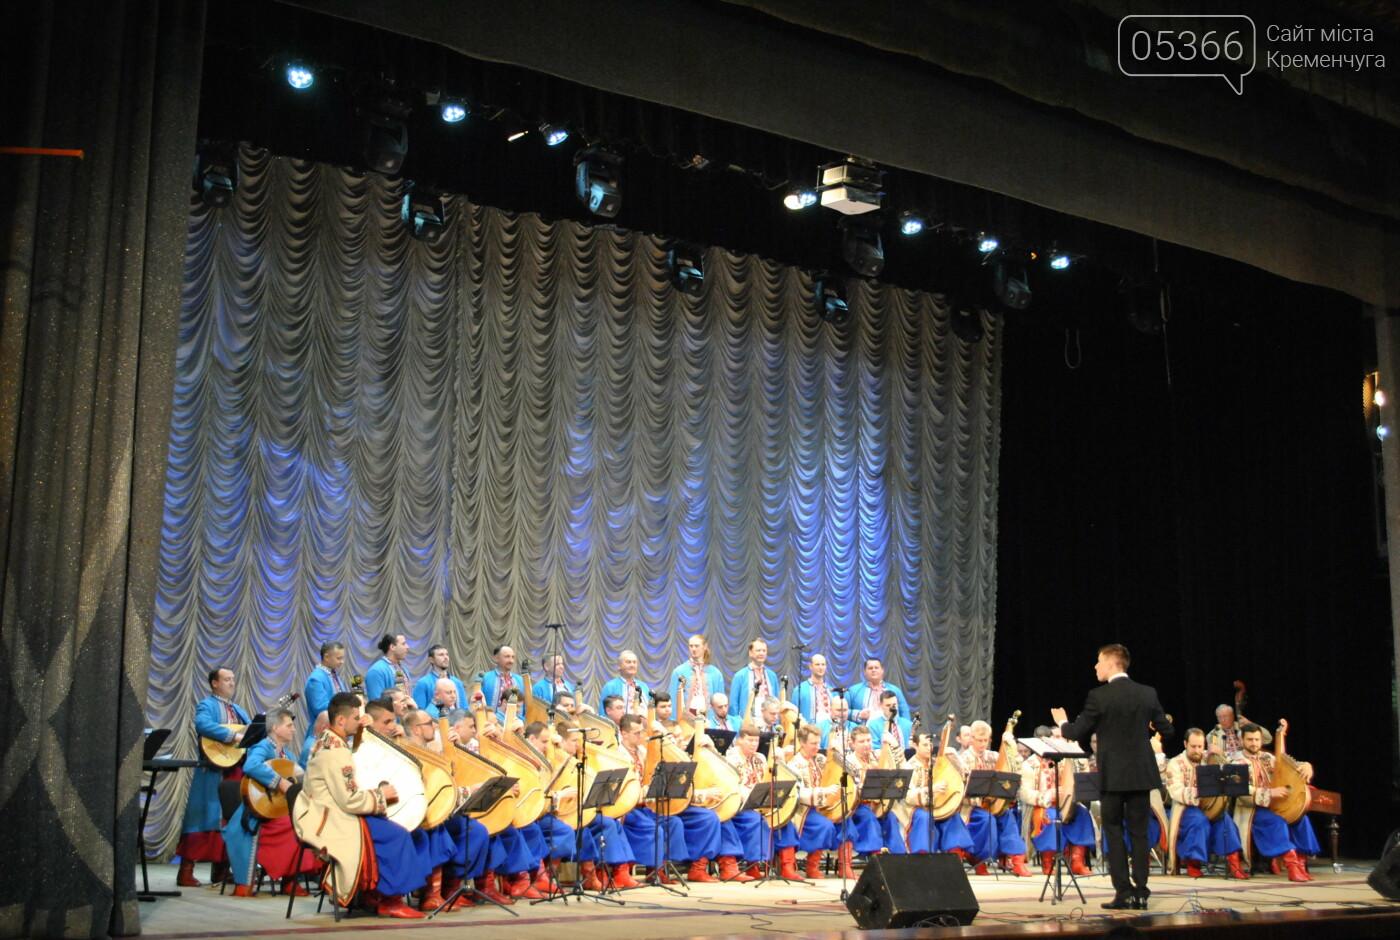 Бандуристи покорили кременчужан своїми виступами та музикою. Фото, фото-6